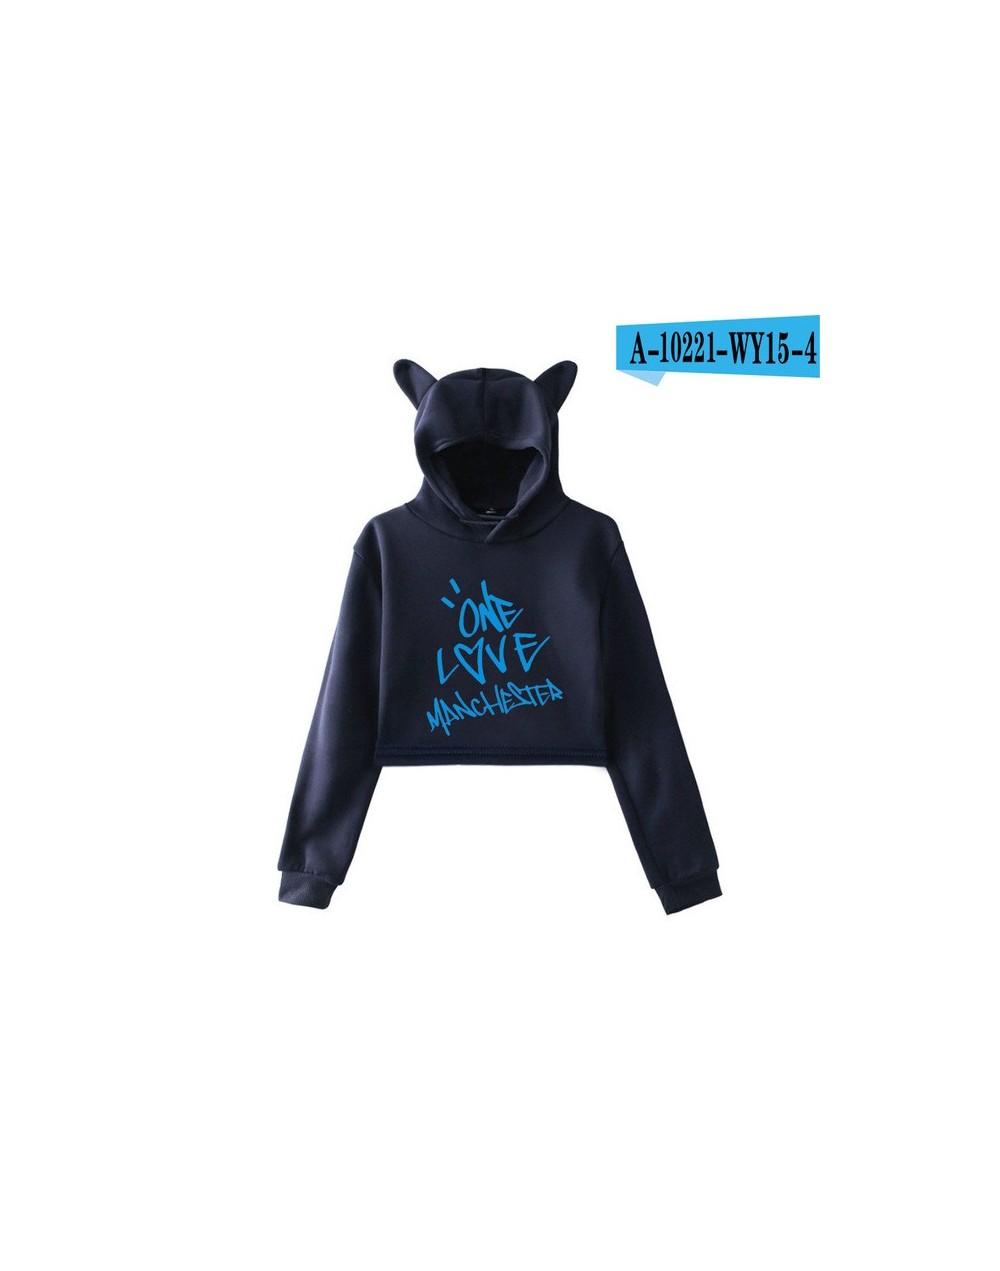 Ariana Grande Thank you next Hoodies Cat Ear Sweatshirt HighStreet Women Casual Fashion Hoodies Sweatshirt Print Outwear - N...